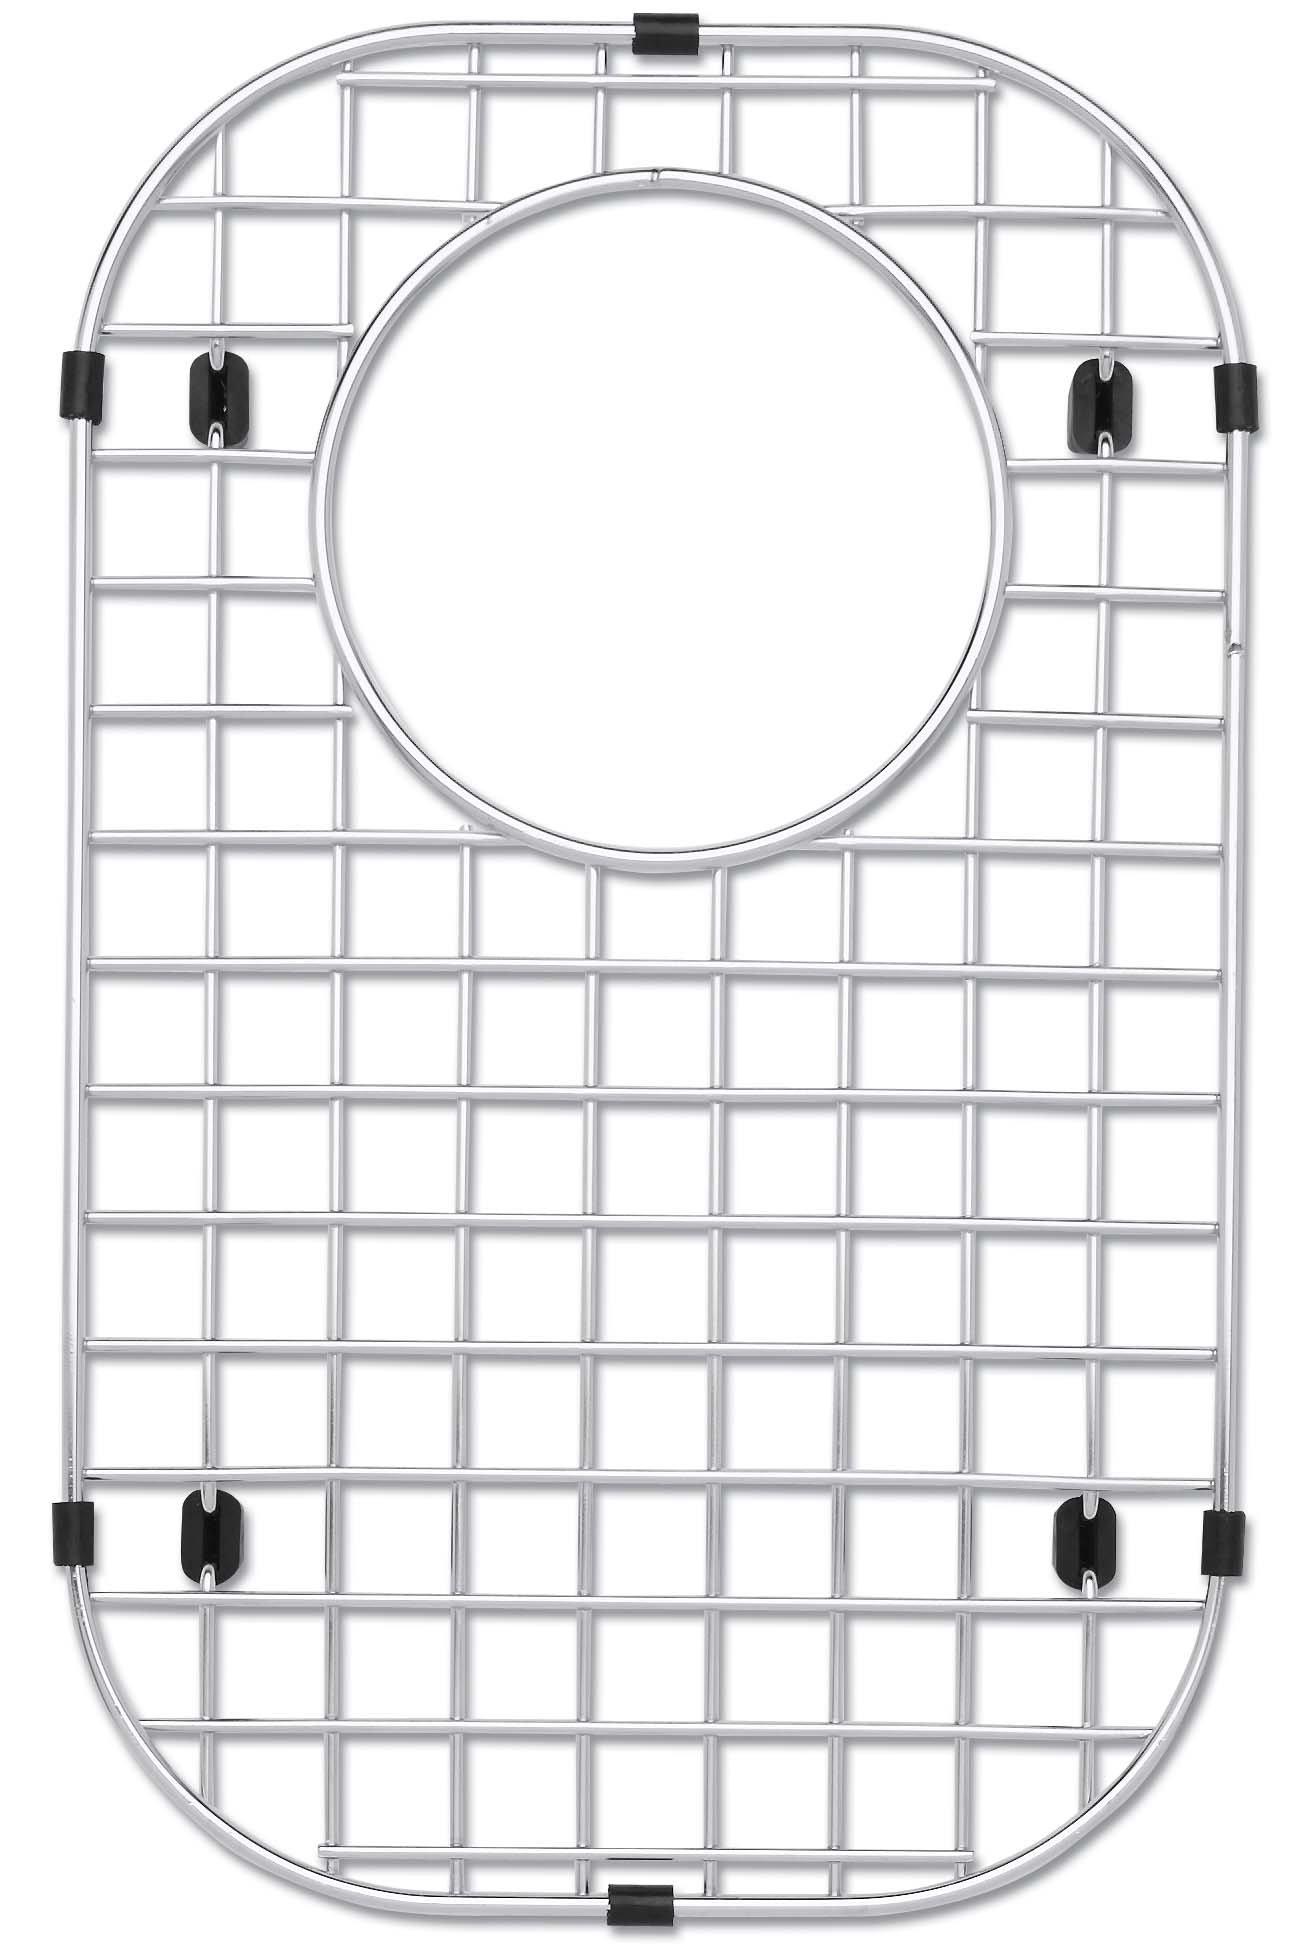 Blanco 220-995 Stainless Steel Sink Grid by Blanco